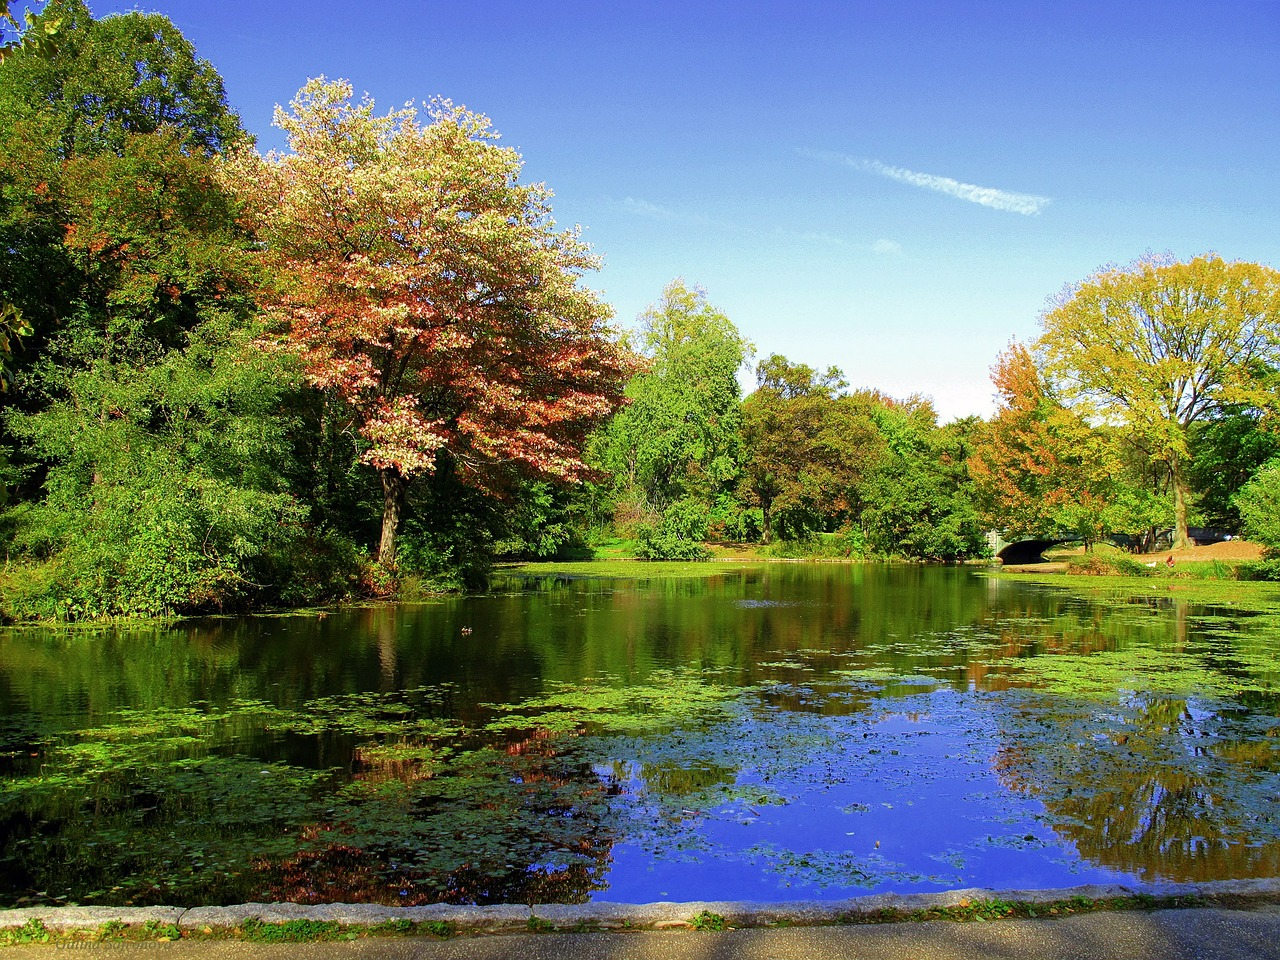 Top 10 best parks in Brooklyn